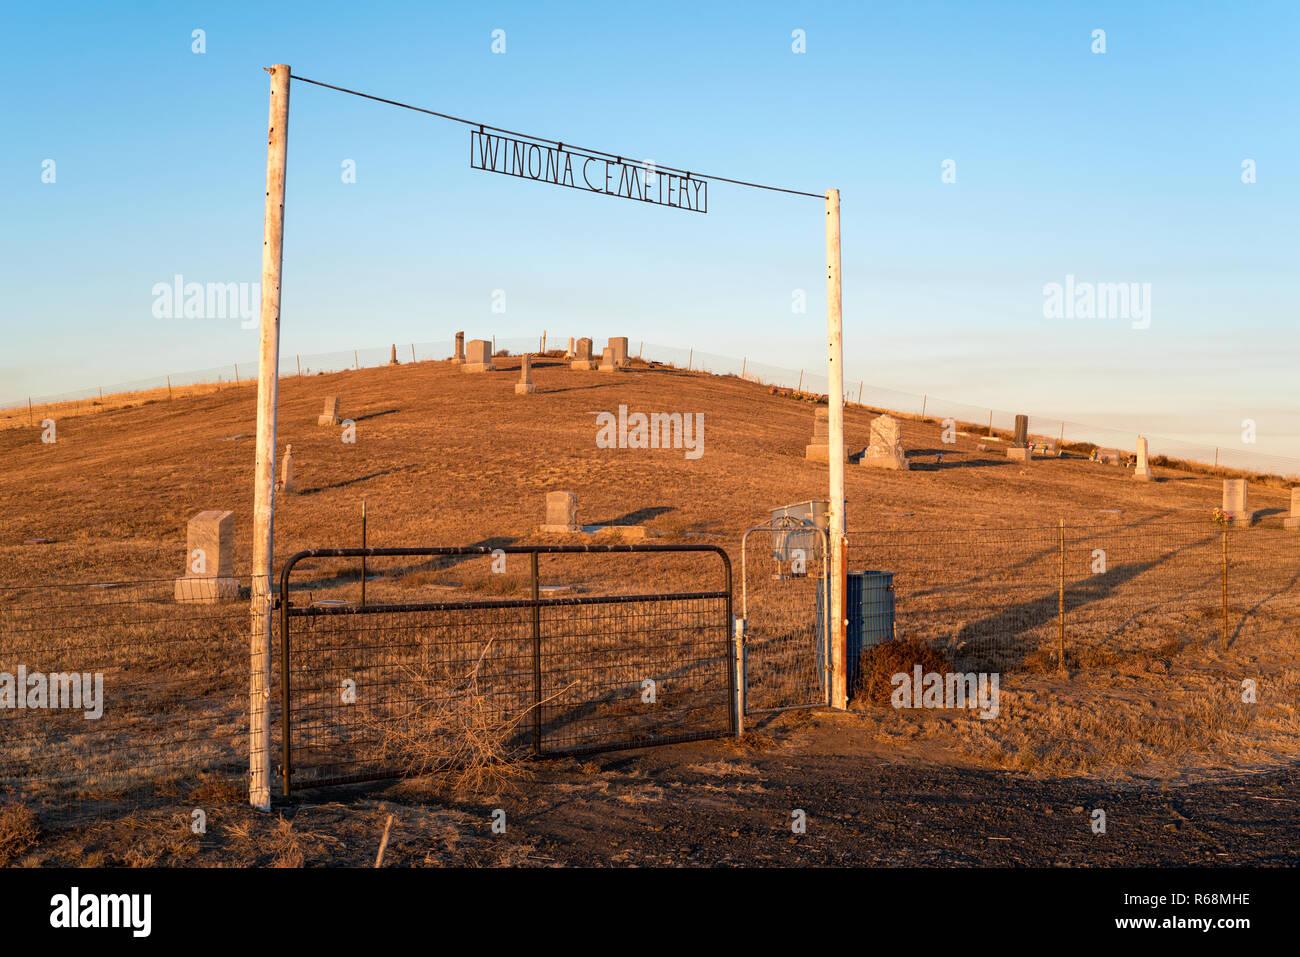 hight resolution of winona cemetery on the palouse prairie in eastern washington stock image